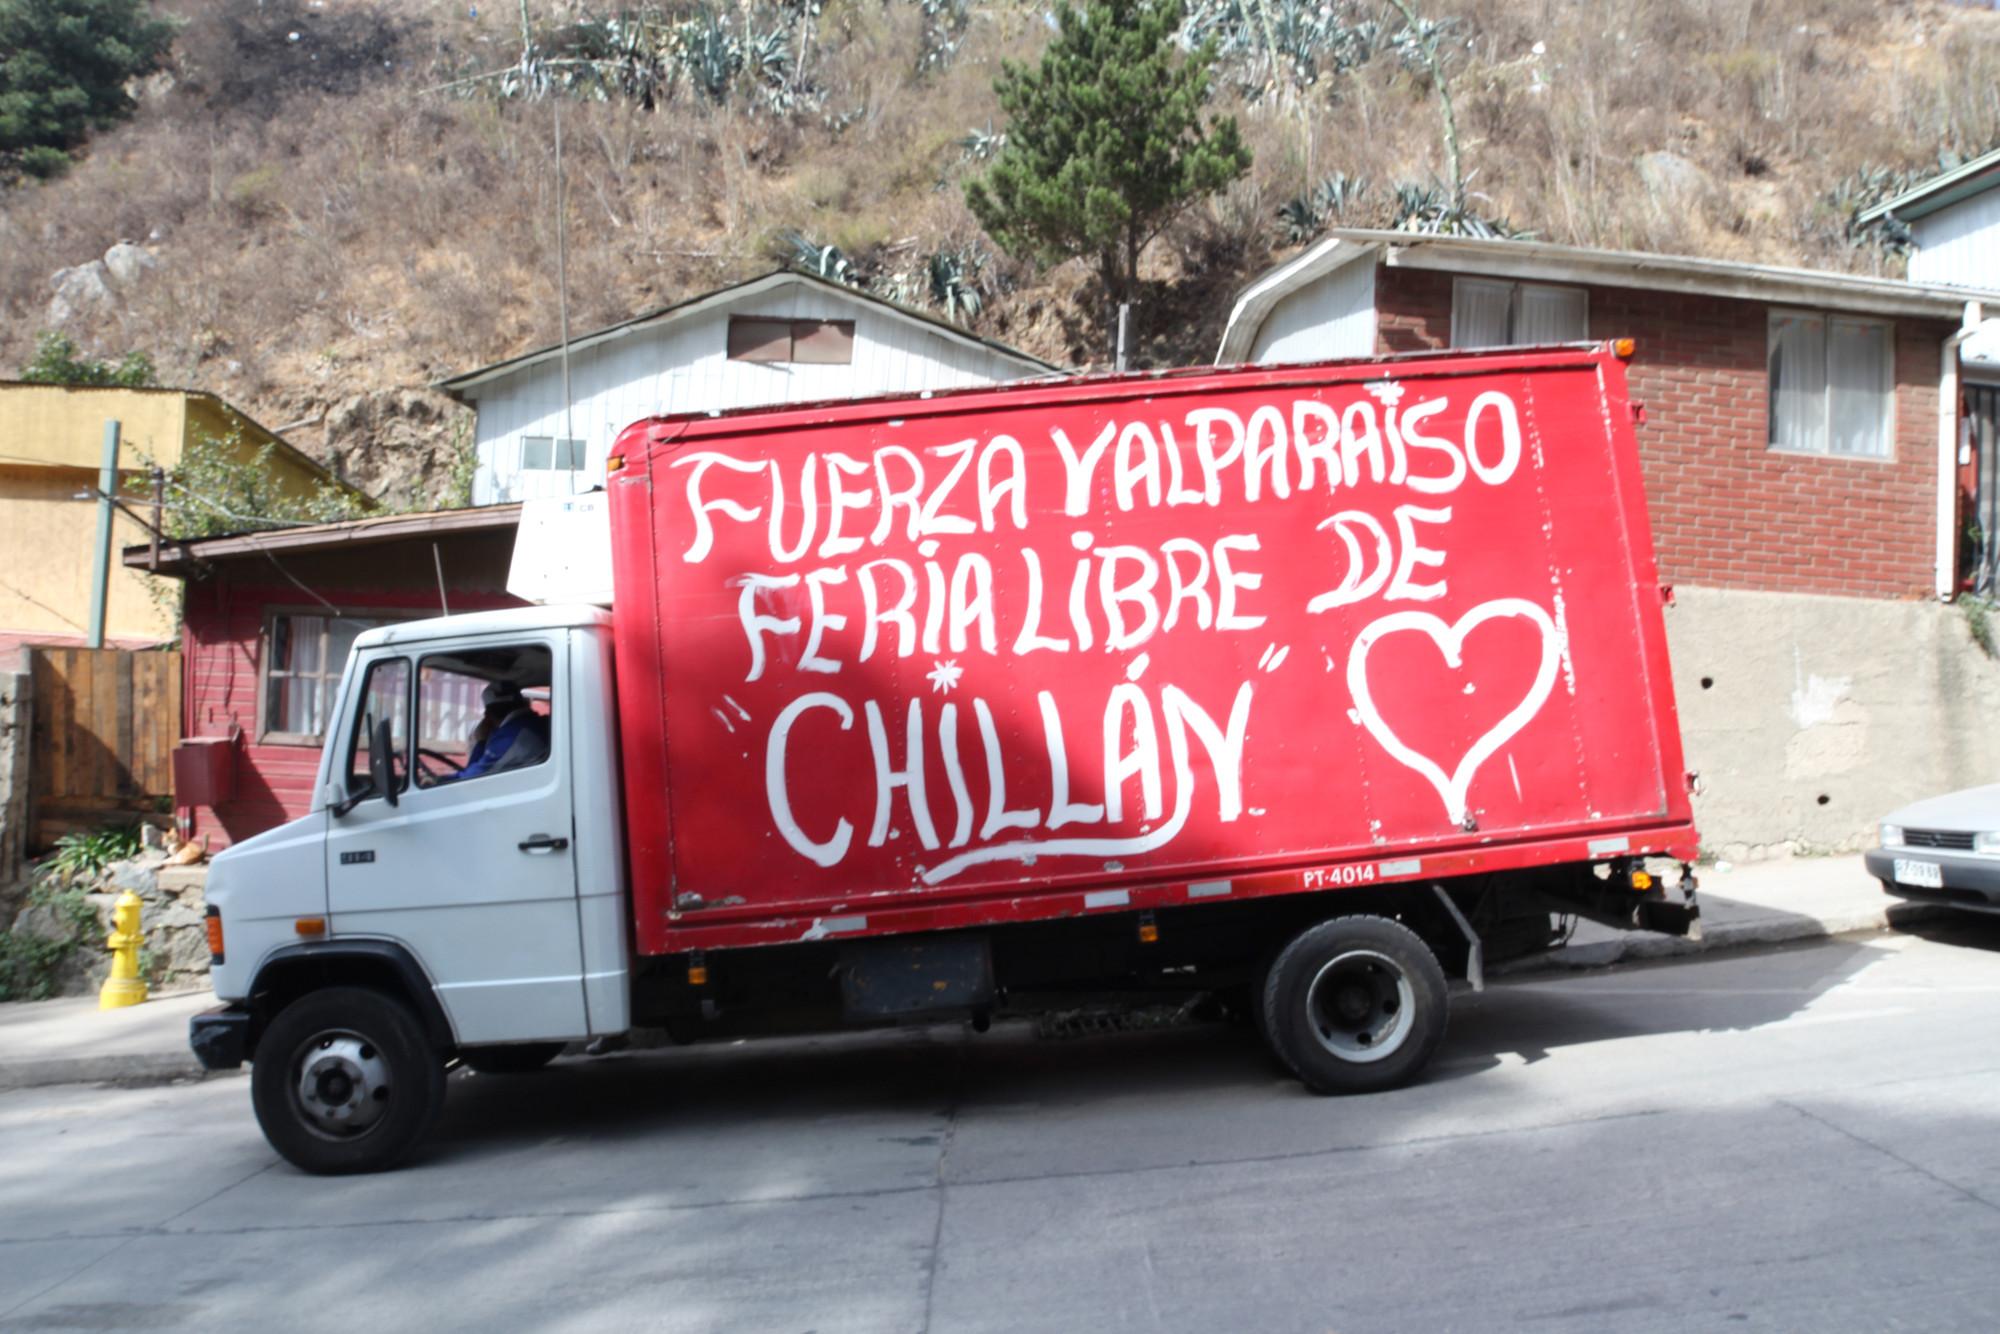 Escuelas de Arquitectura de Valparaíso se reúnen para decidir futuros pasos ante la reconstrucción, Avenida Francia, Valparaíso. Image Courtesy of Nicolás Valencia